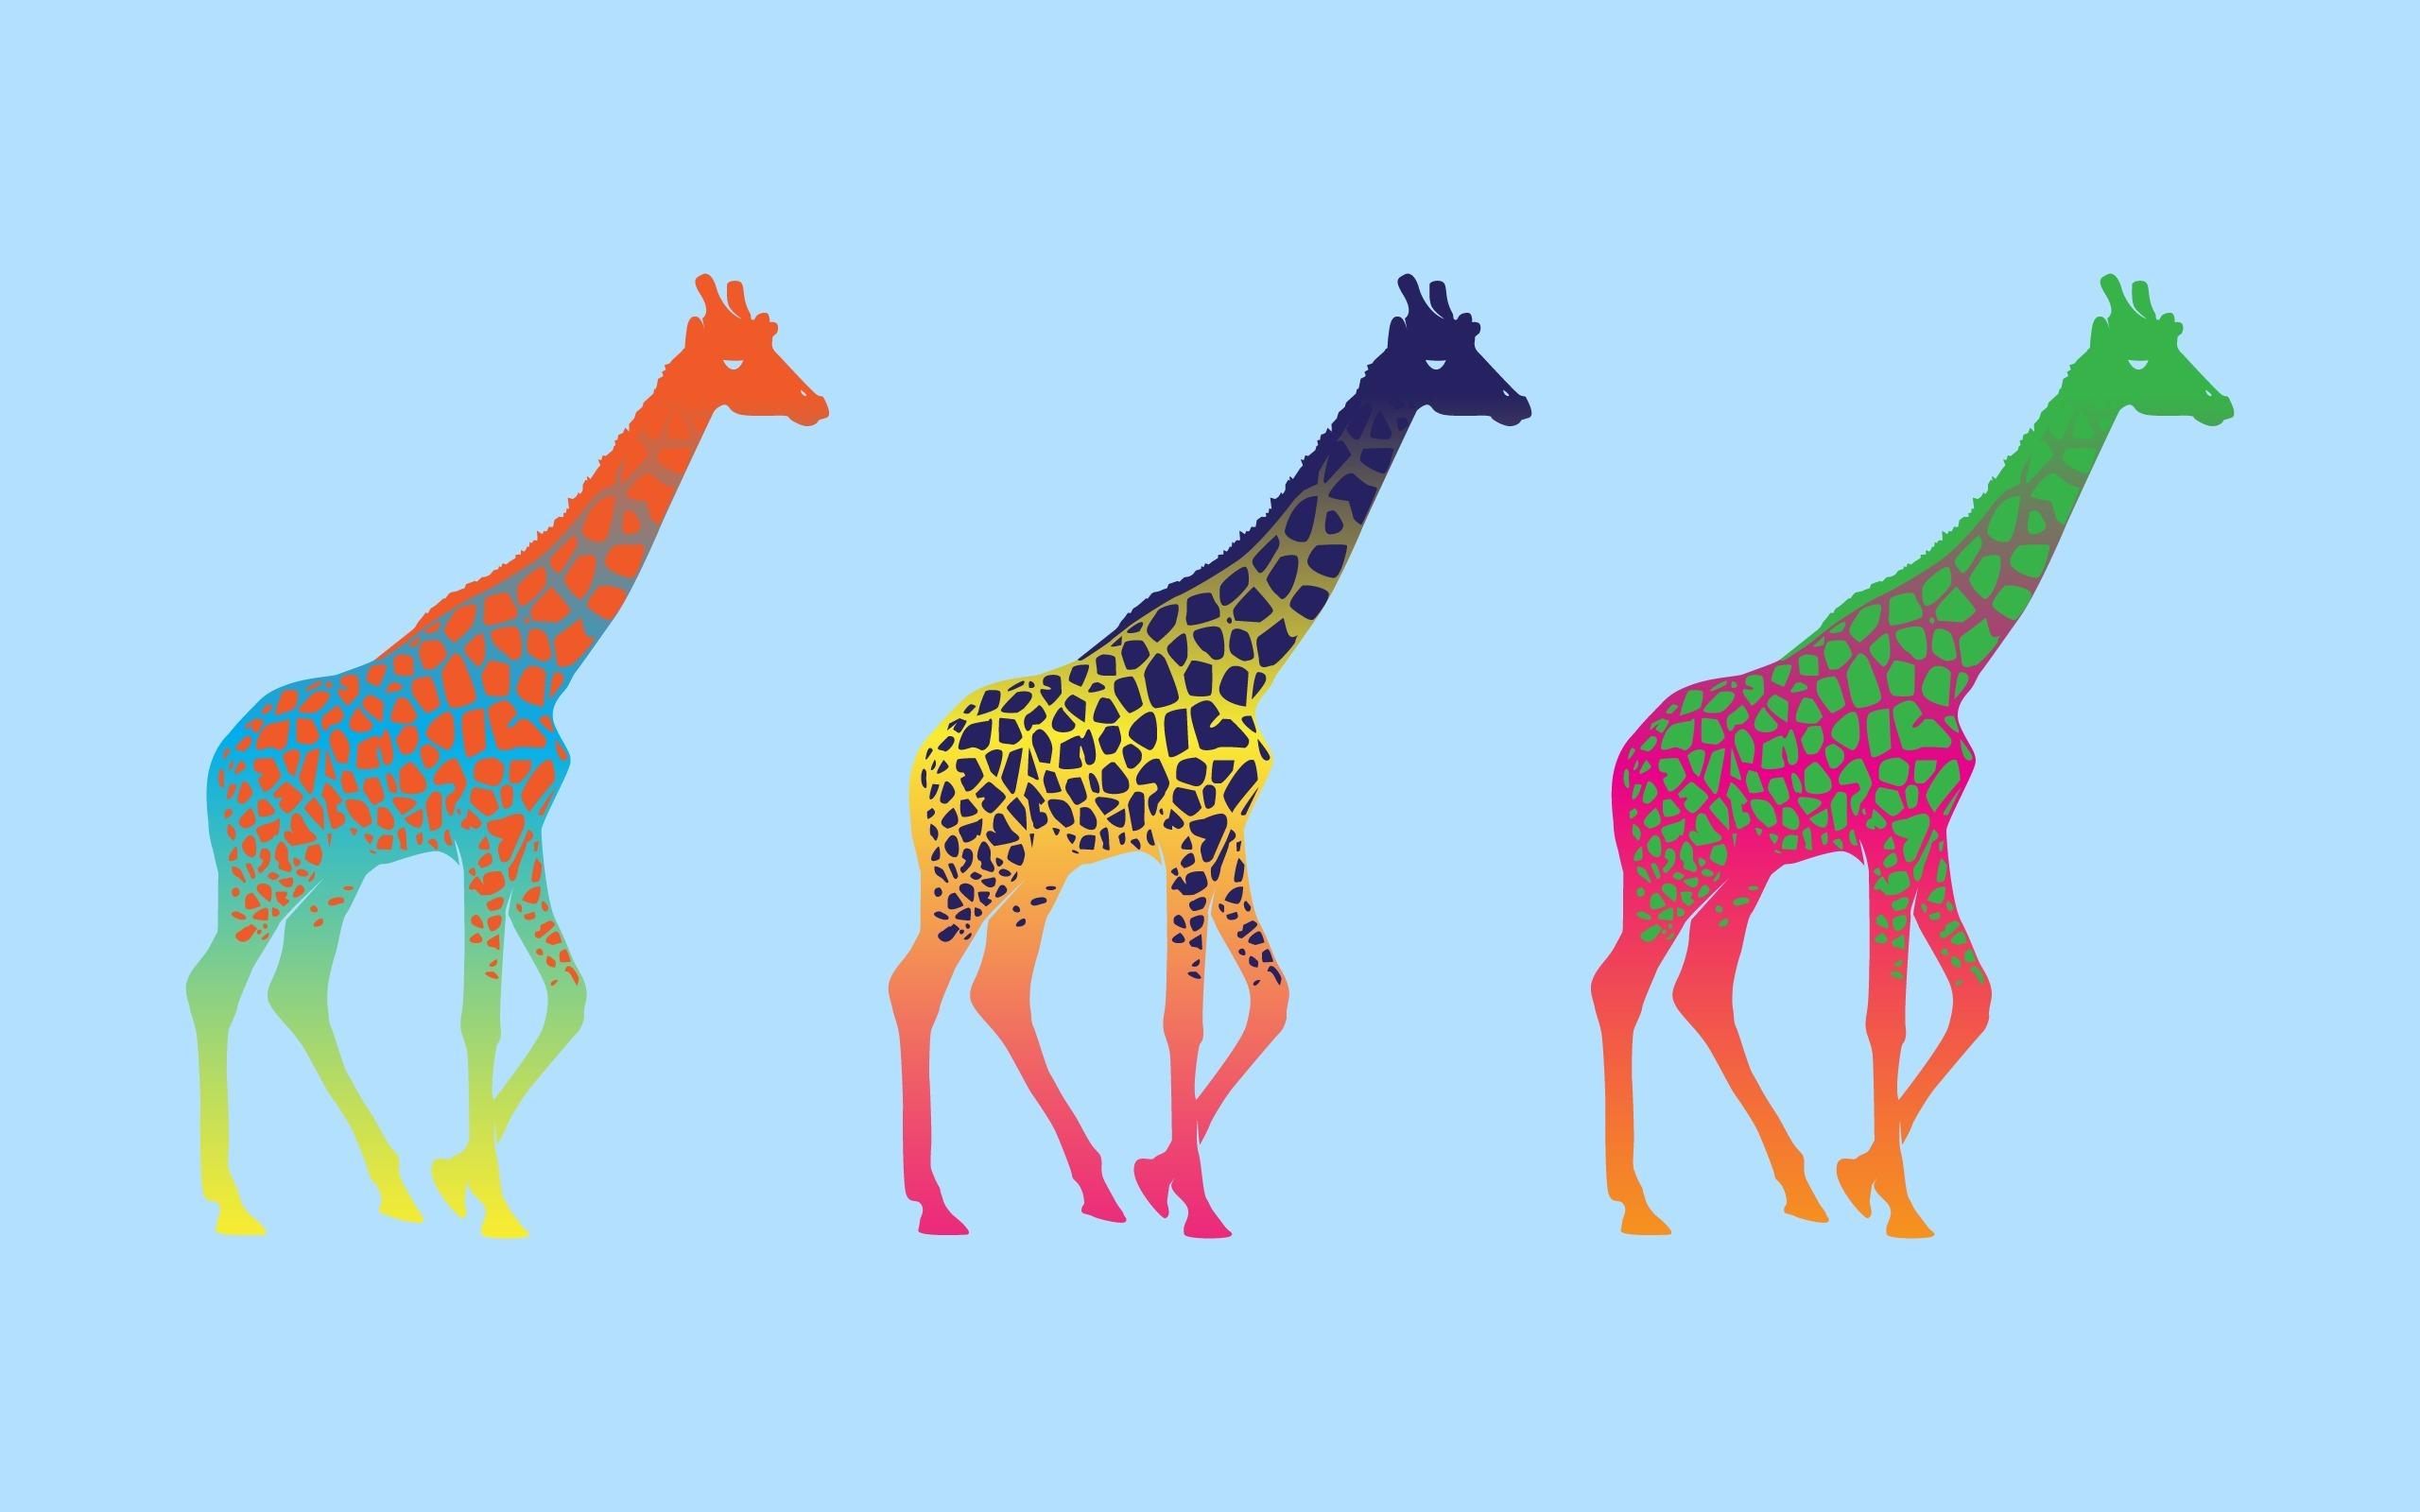 Desktop wallpapers pop art - Giraffe Colorful Pop Art Minimalism Desktop Wallpaper Download Giraffe